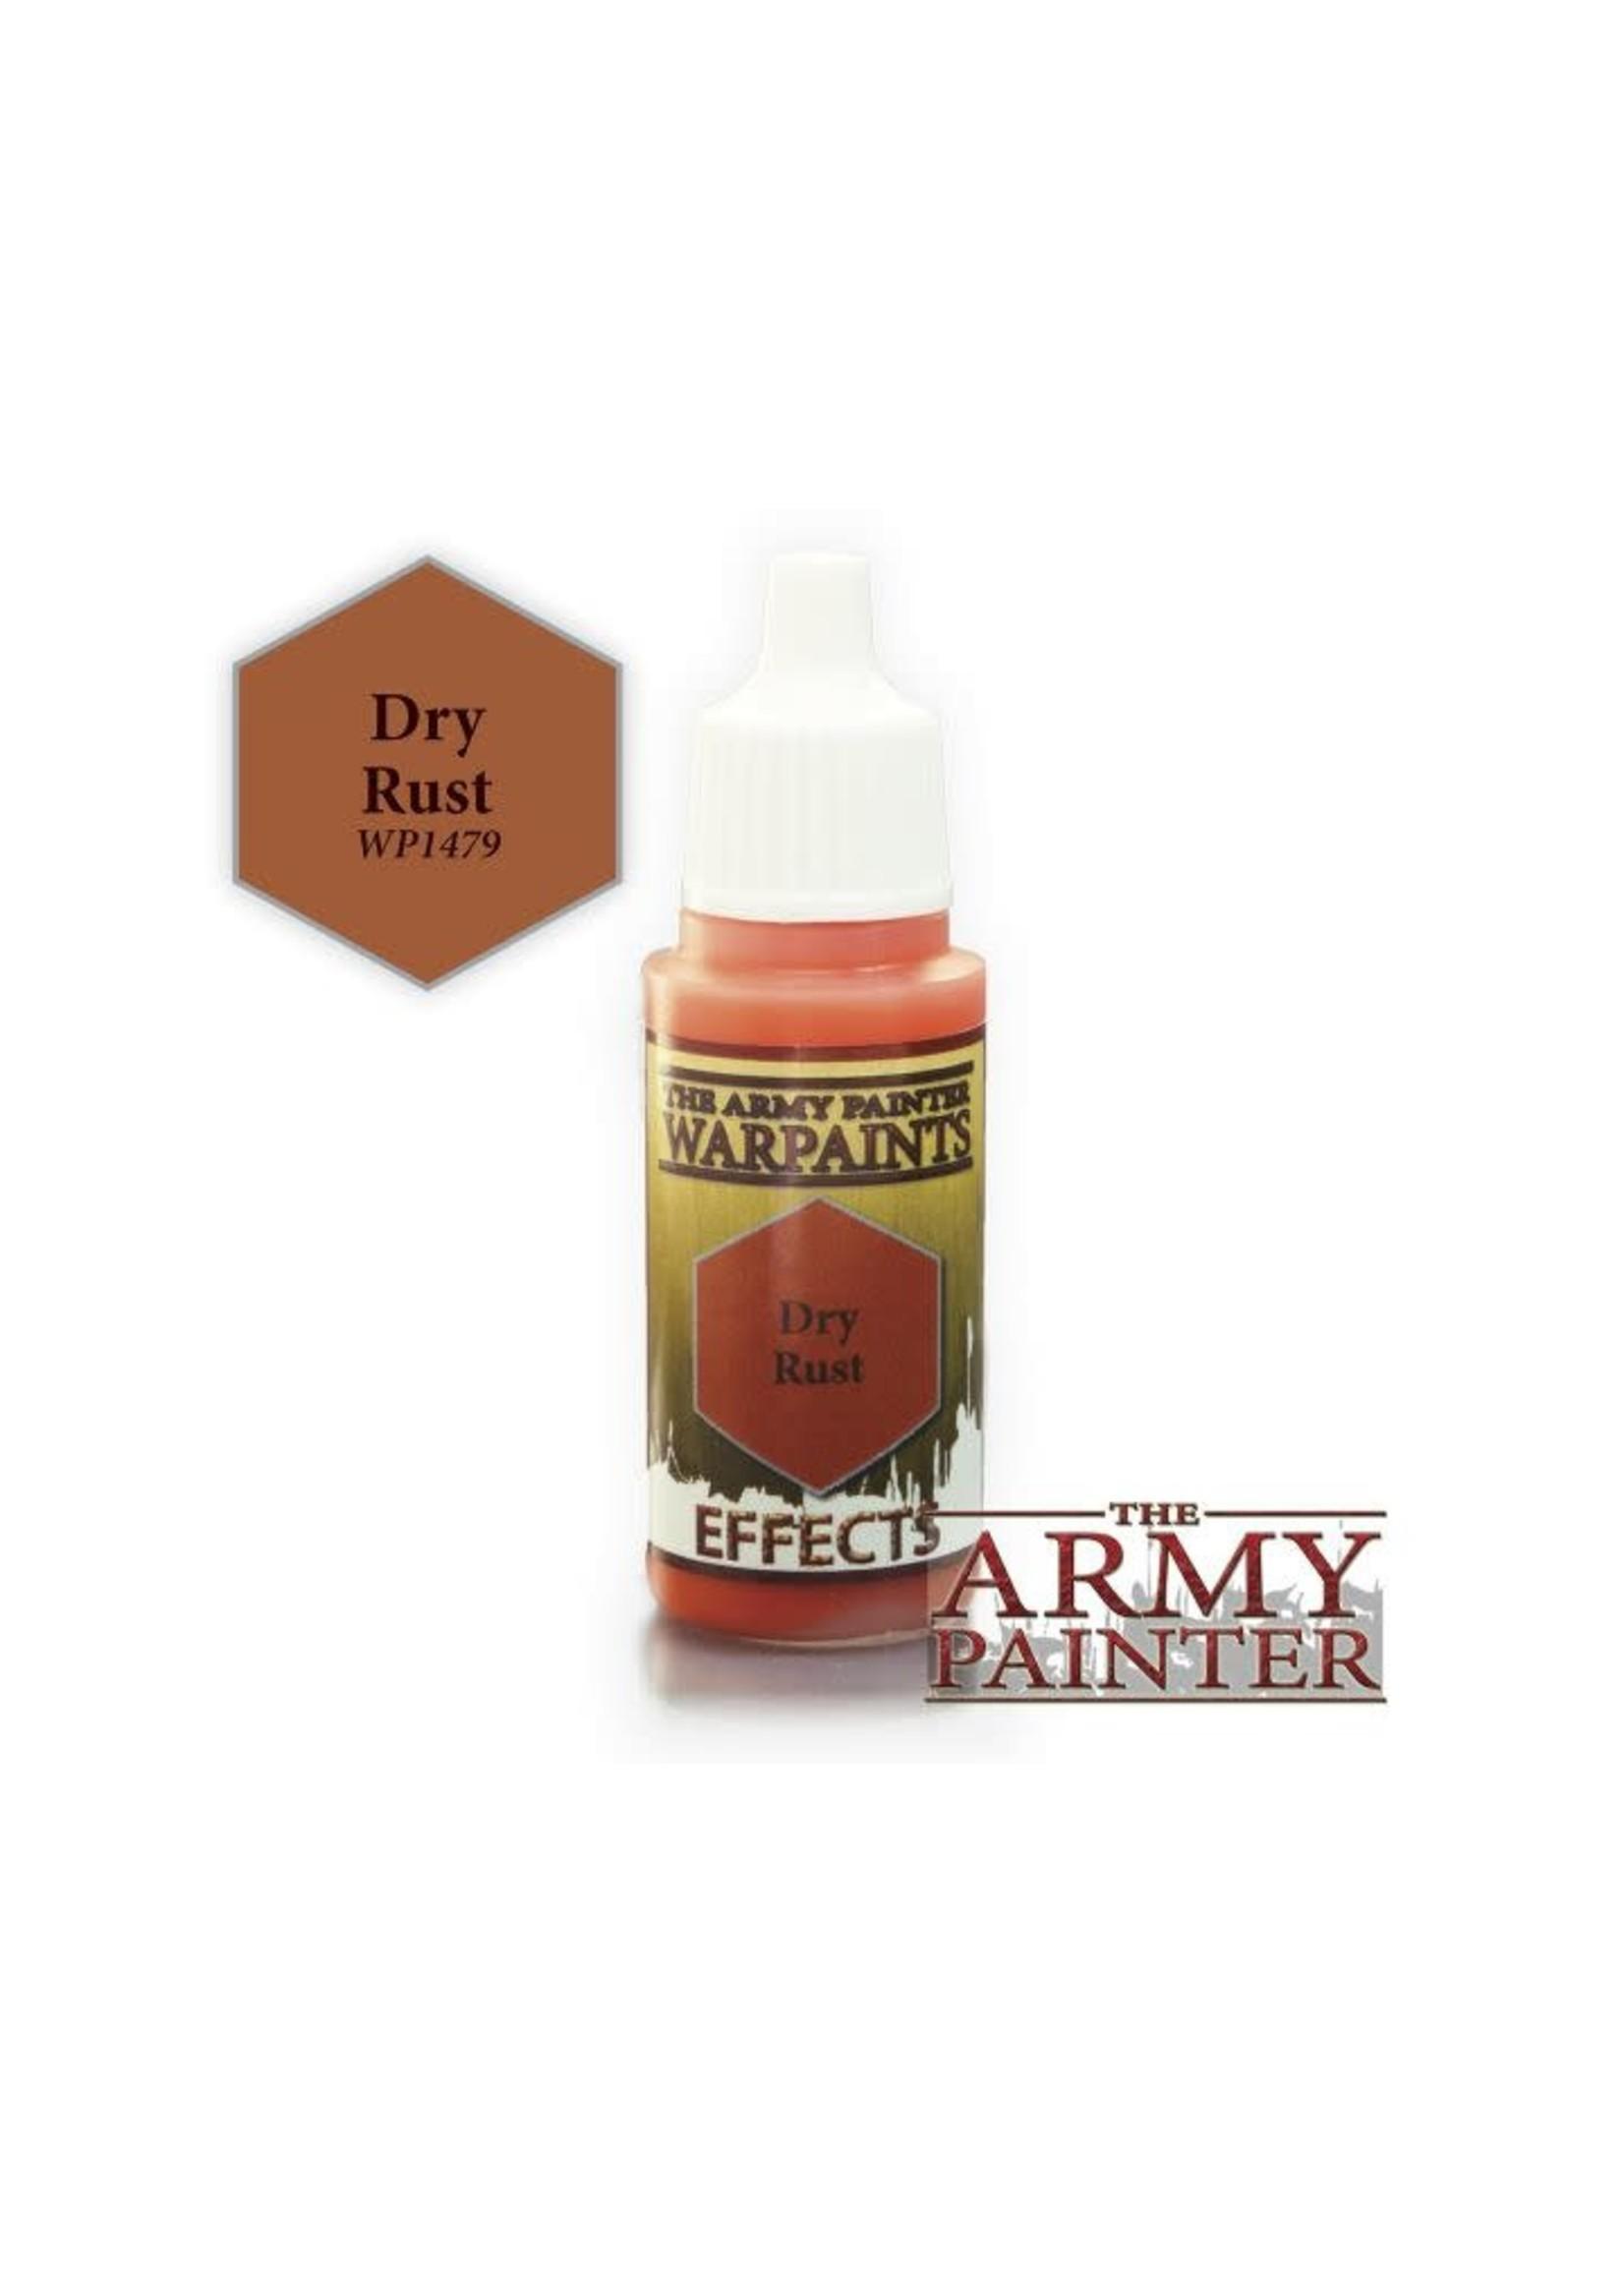 Army Painter Warpaints - Dry Rust